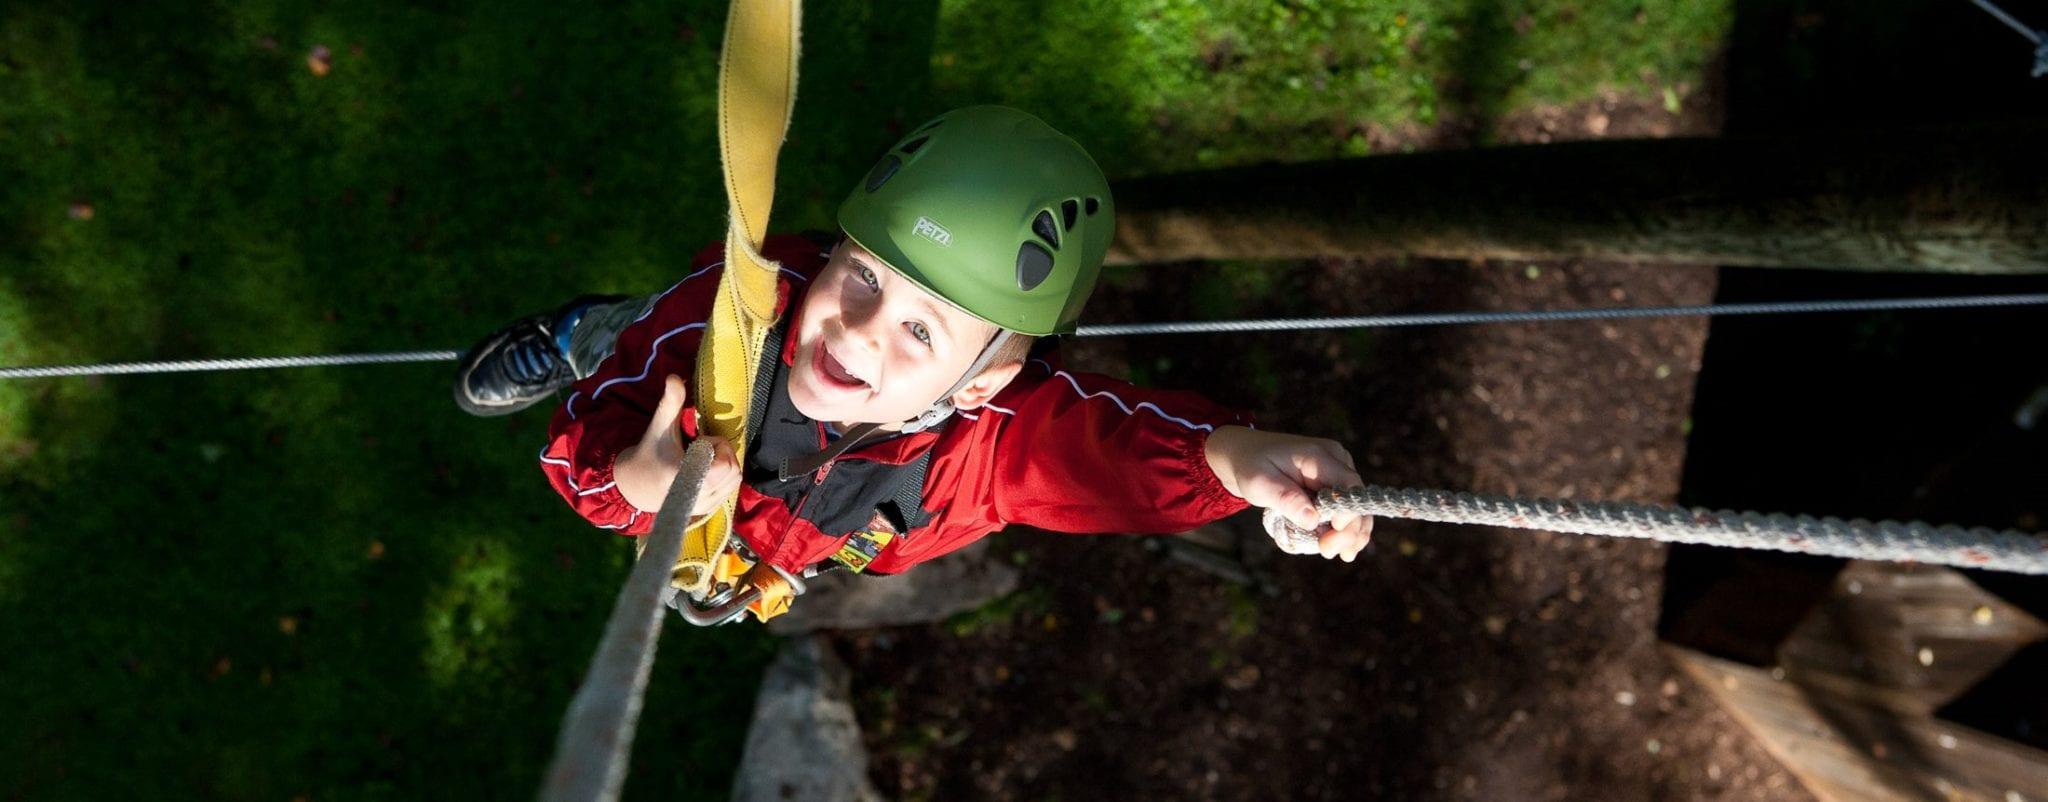 Kids-Zipline-Activity-Slider